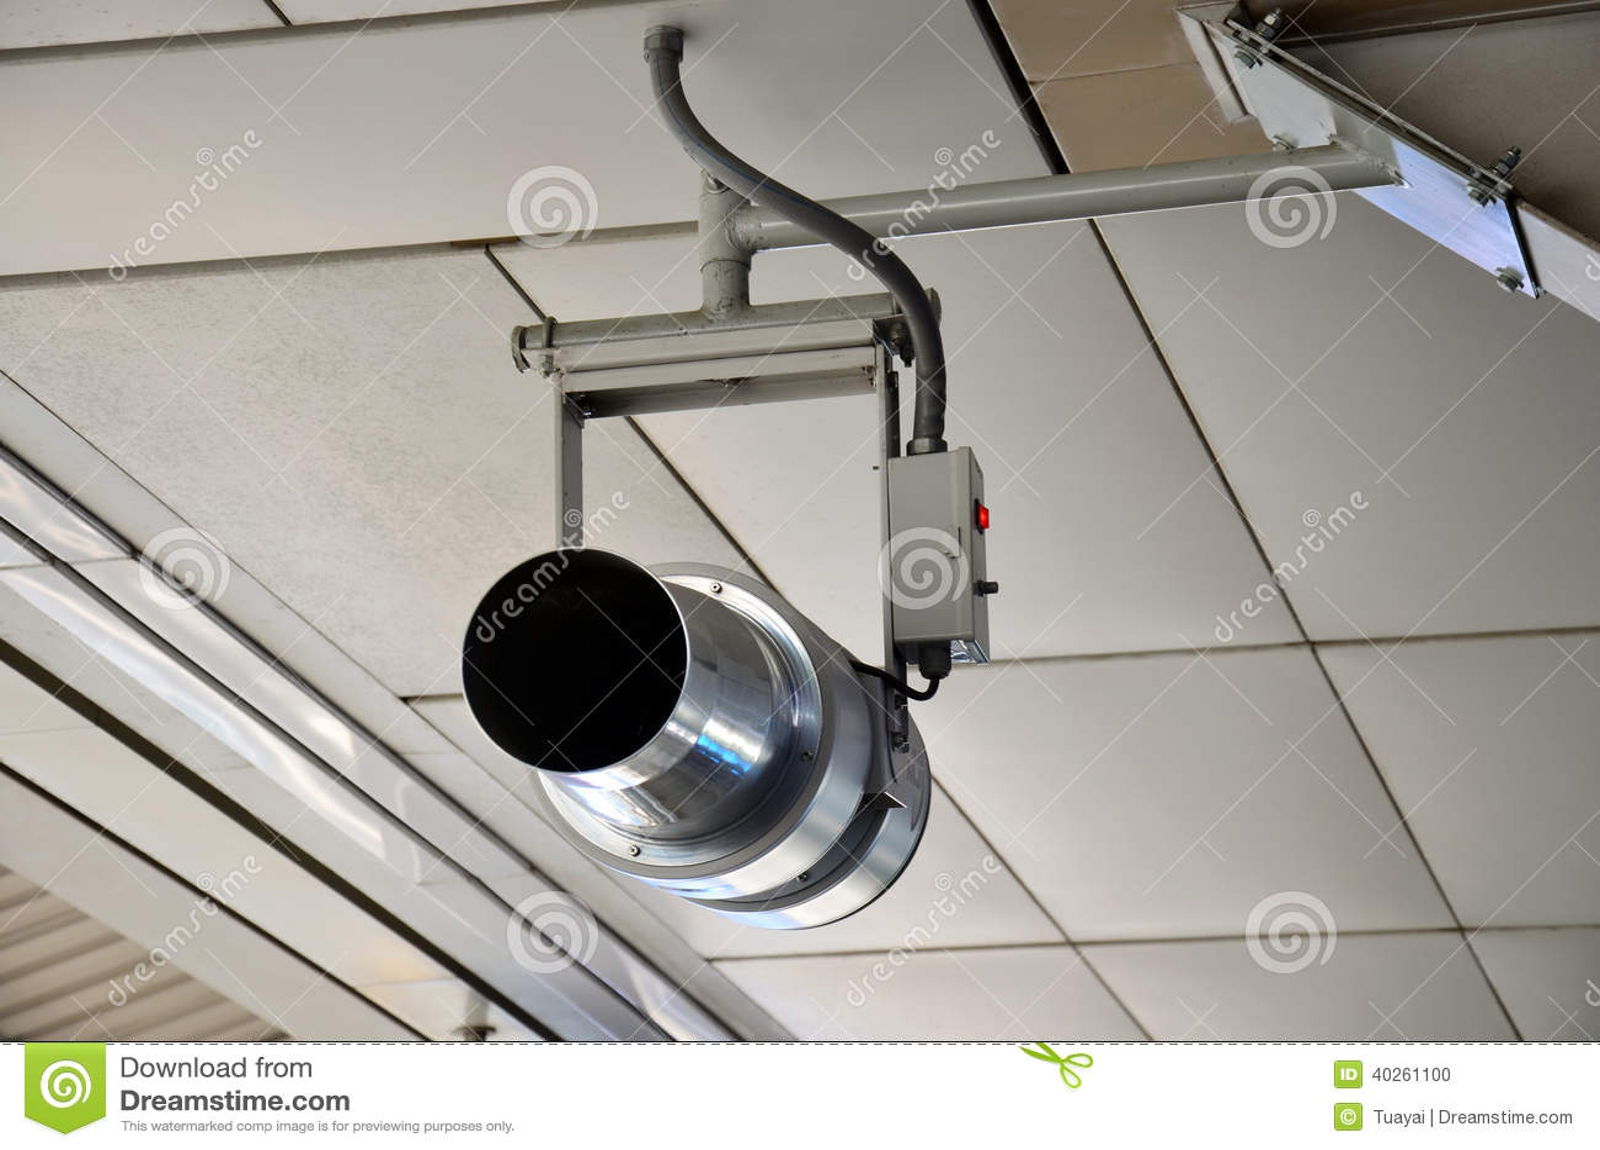 Centrifugal Air Blower : Blower fan stock photo image